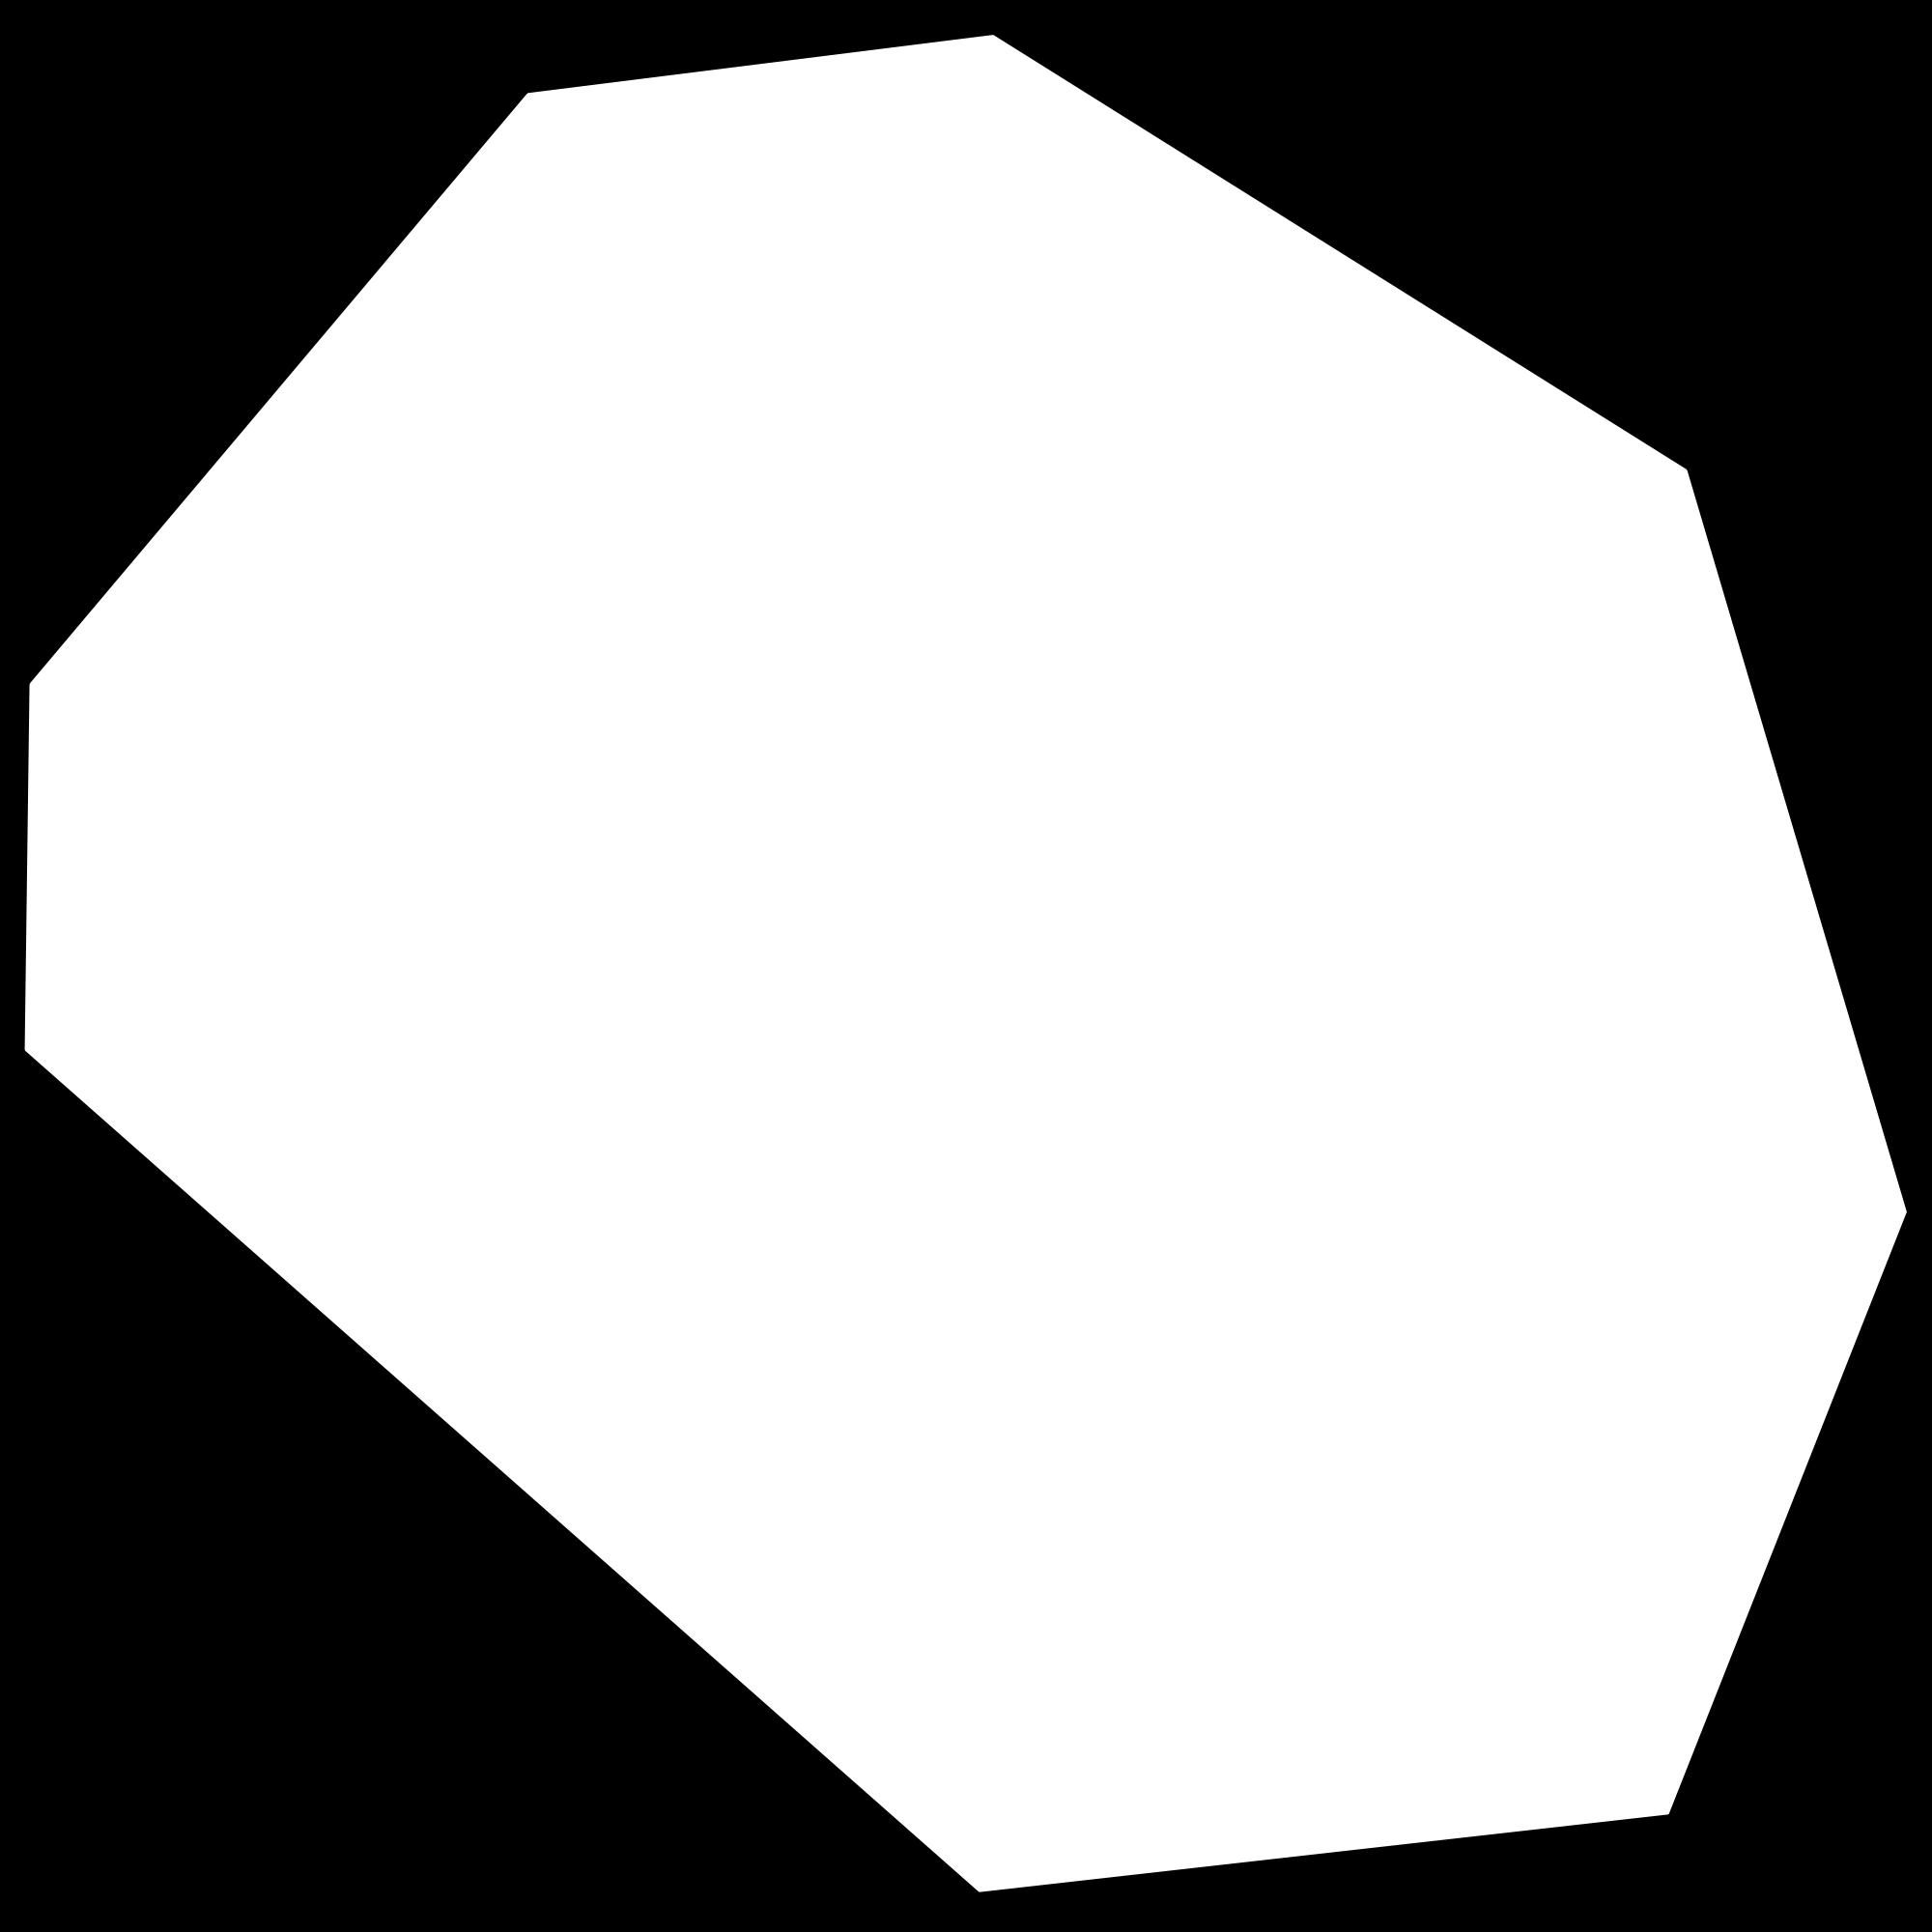 File octagon svg wikimedia. Hexagon clipart irregular